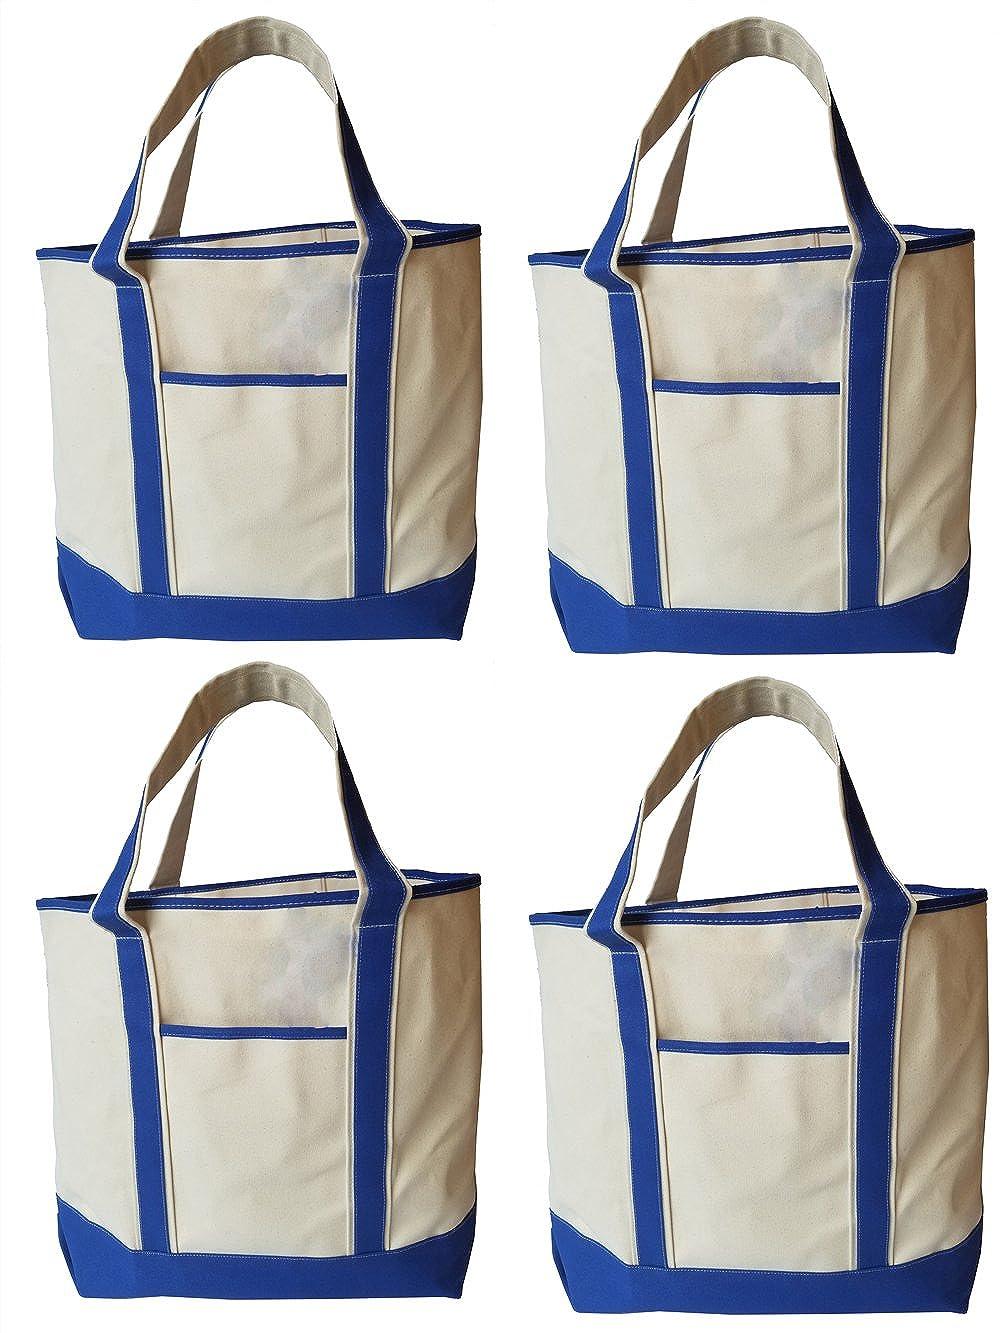 Deluxe Canvas Tote Shoulder Messenger Beach Bag, 22 x 16 Heavy duty cotton